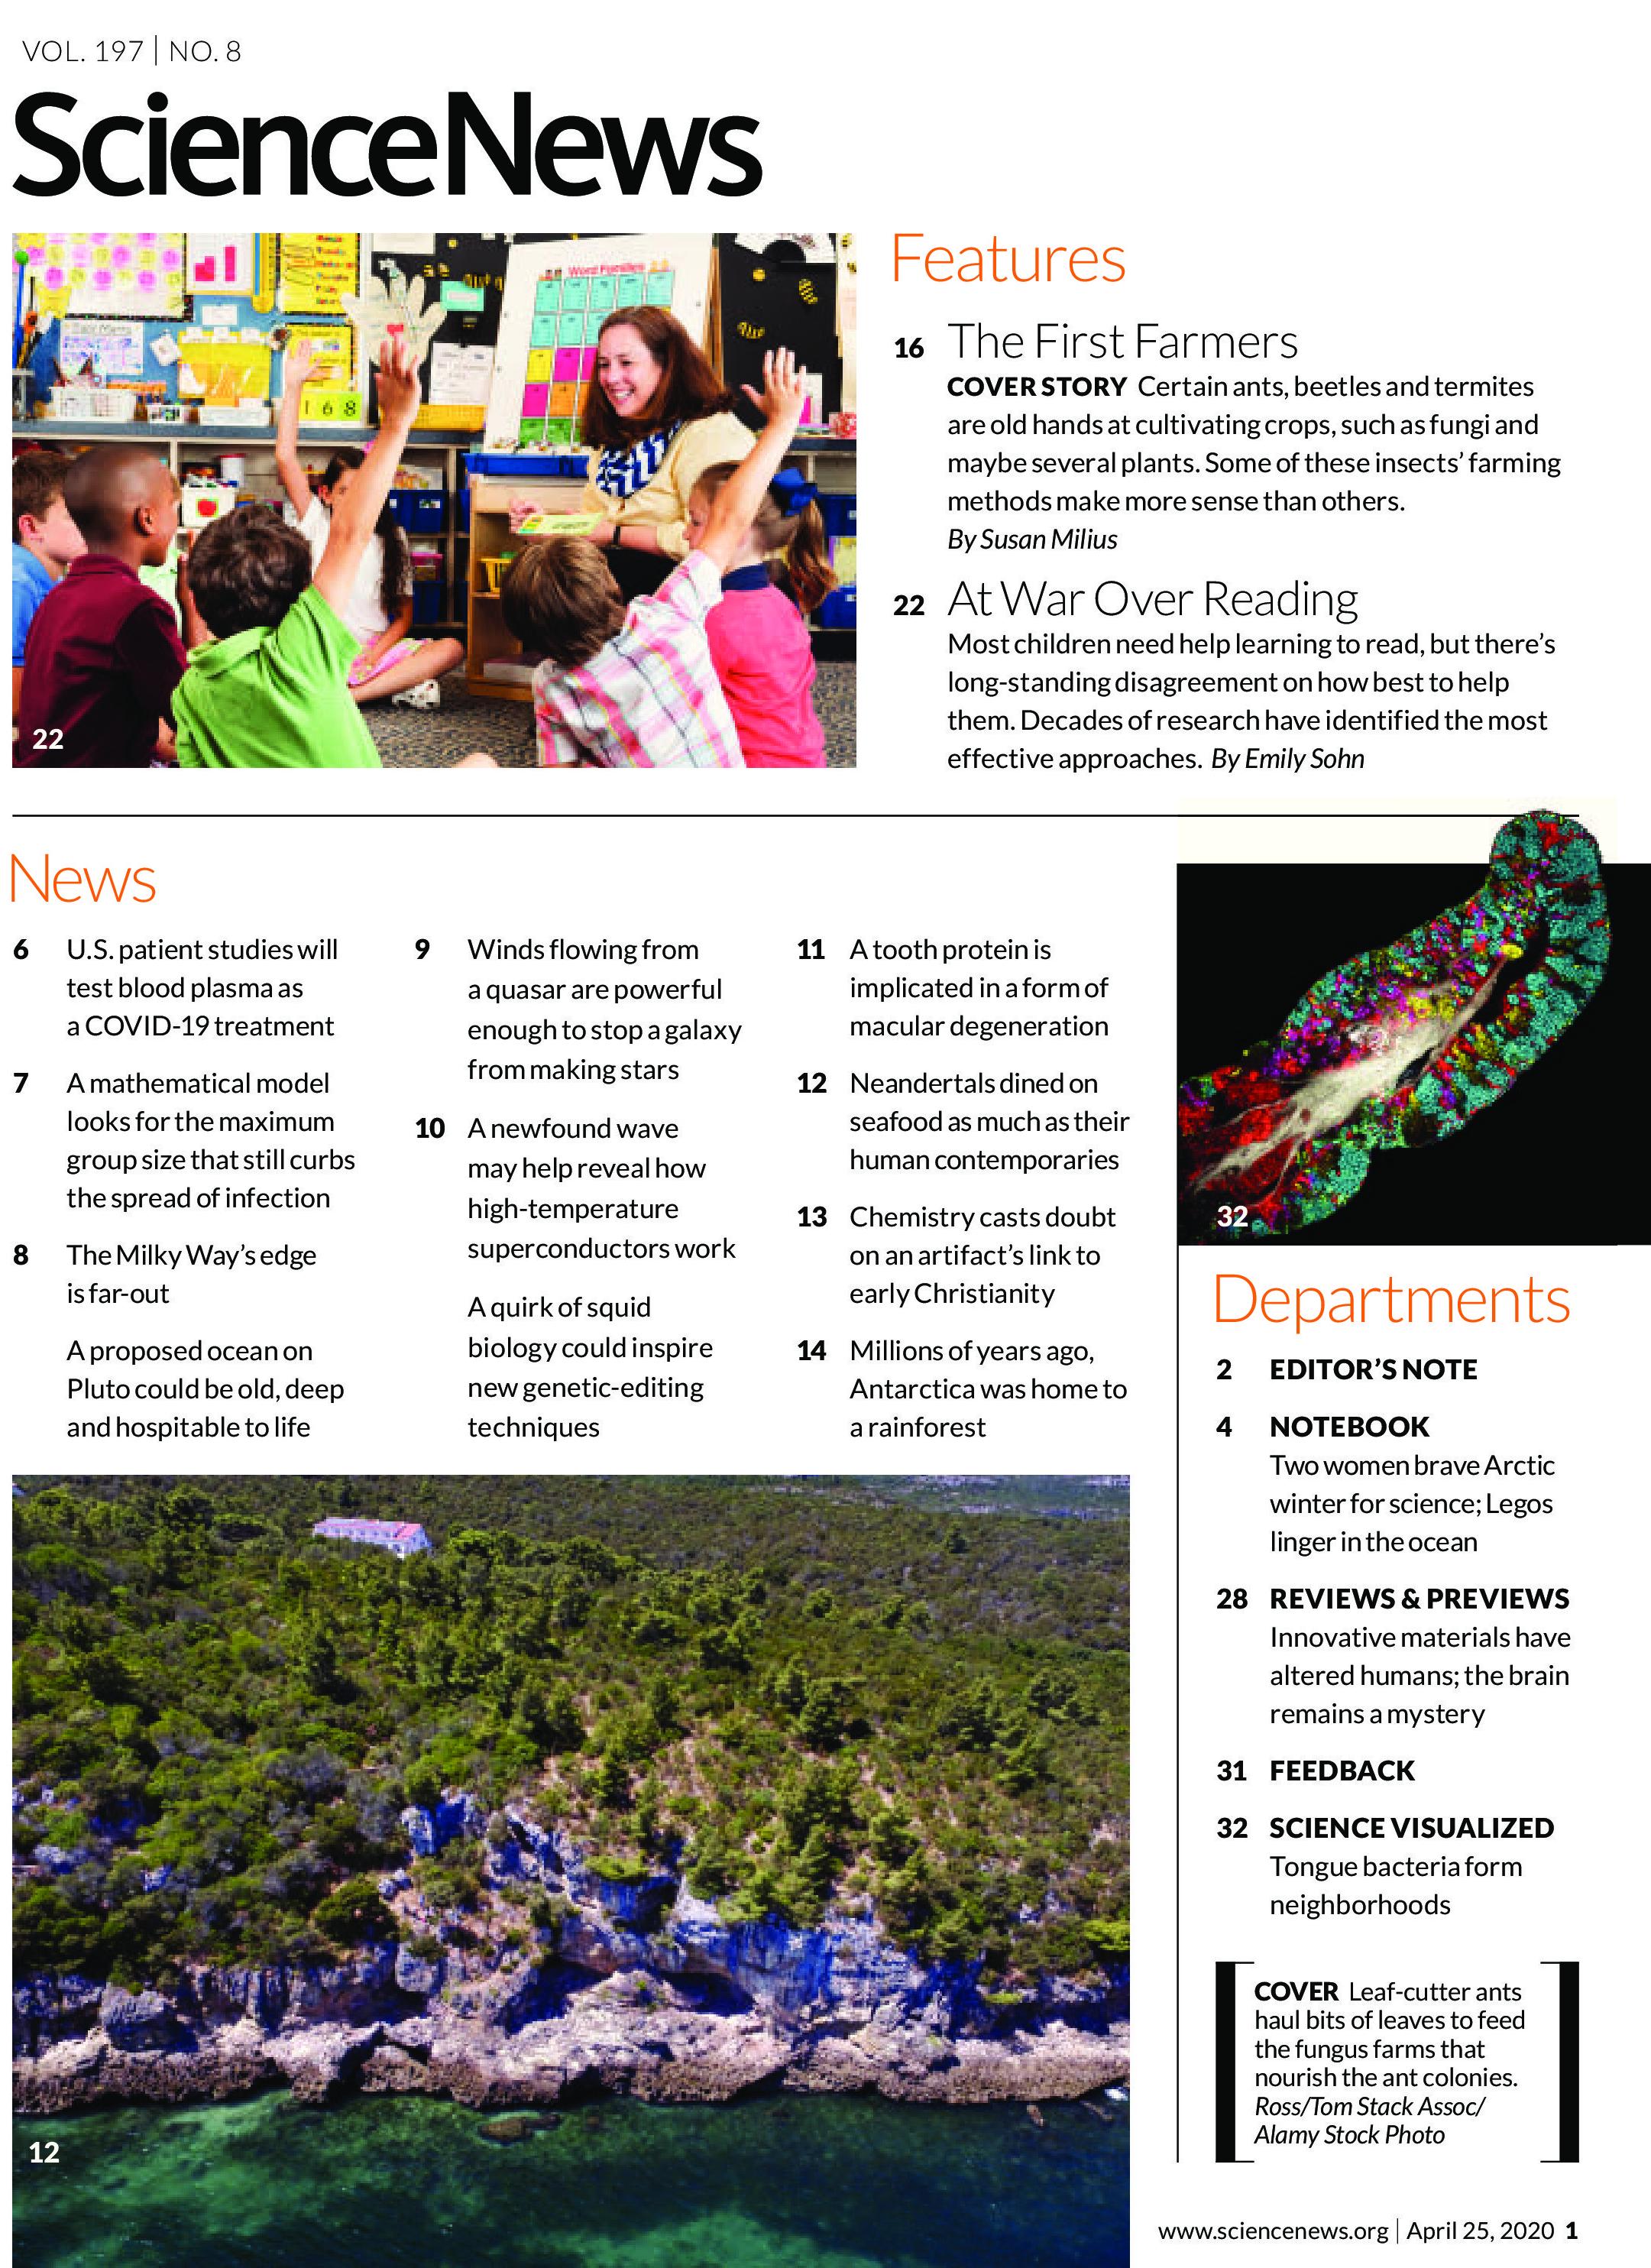 sciencenews20200425-dl-page-2